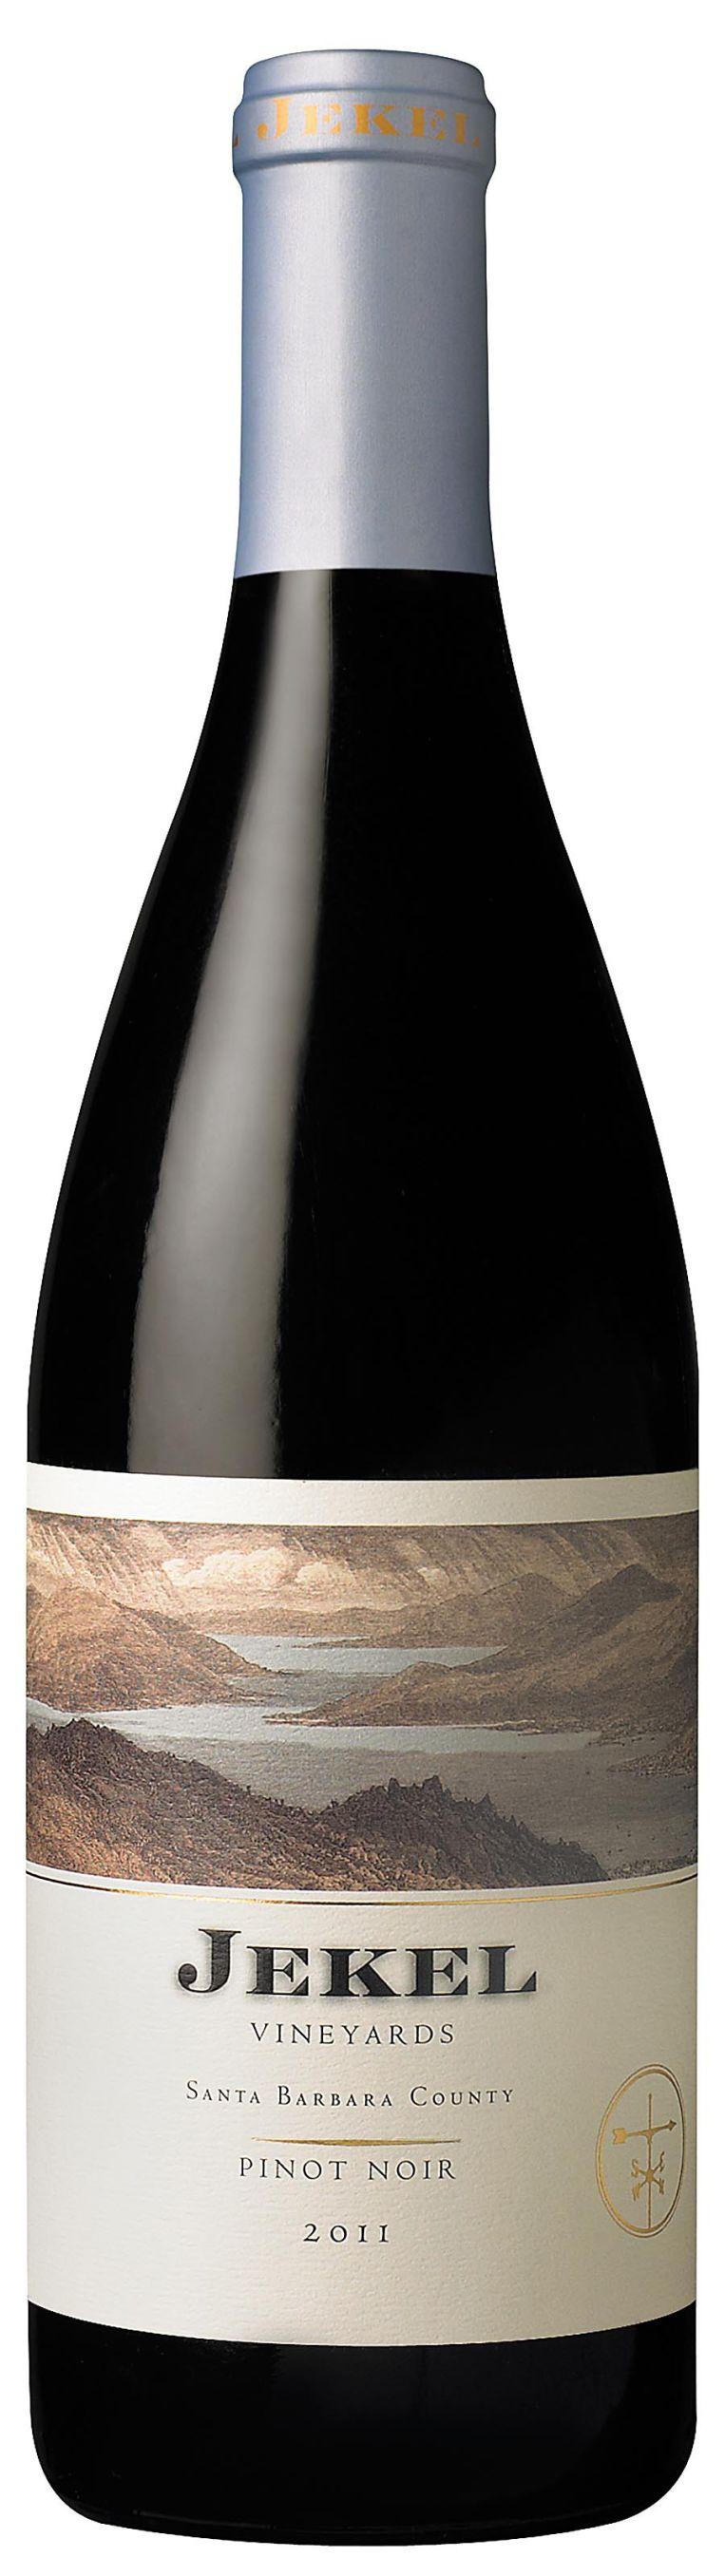 2011 Jekel Vineyards Pinot Noir_lowres